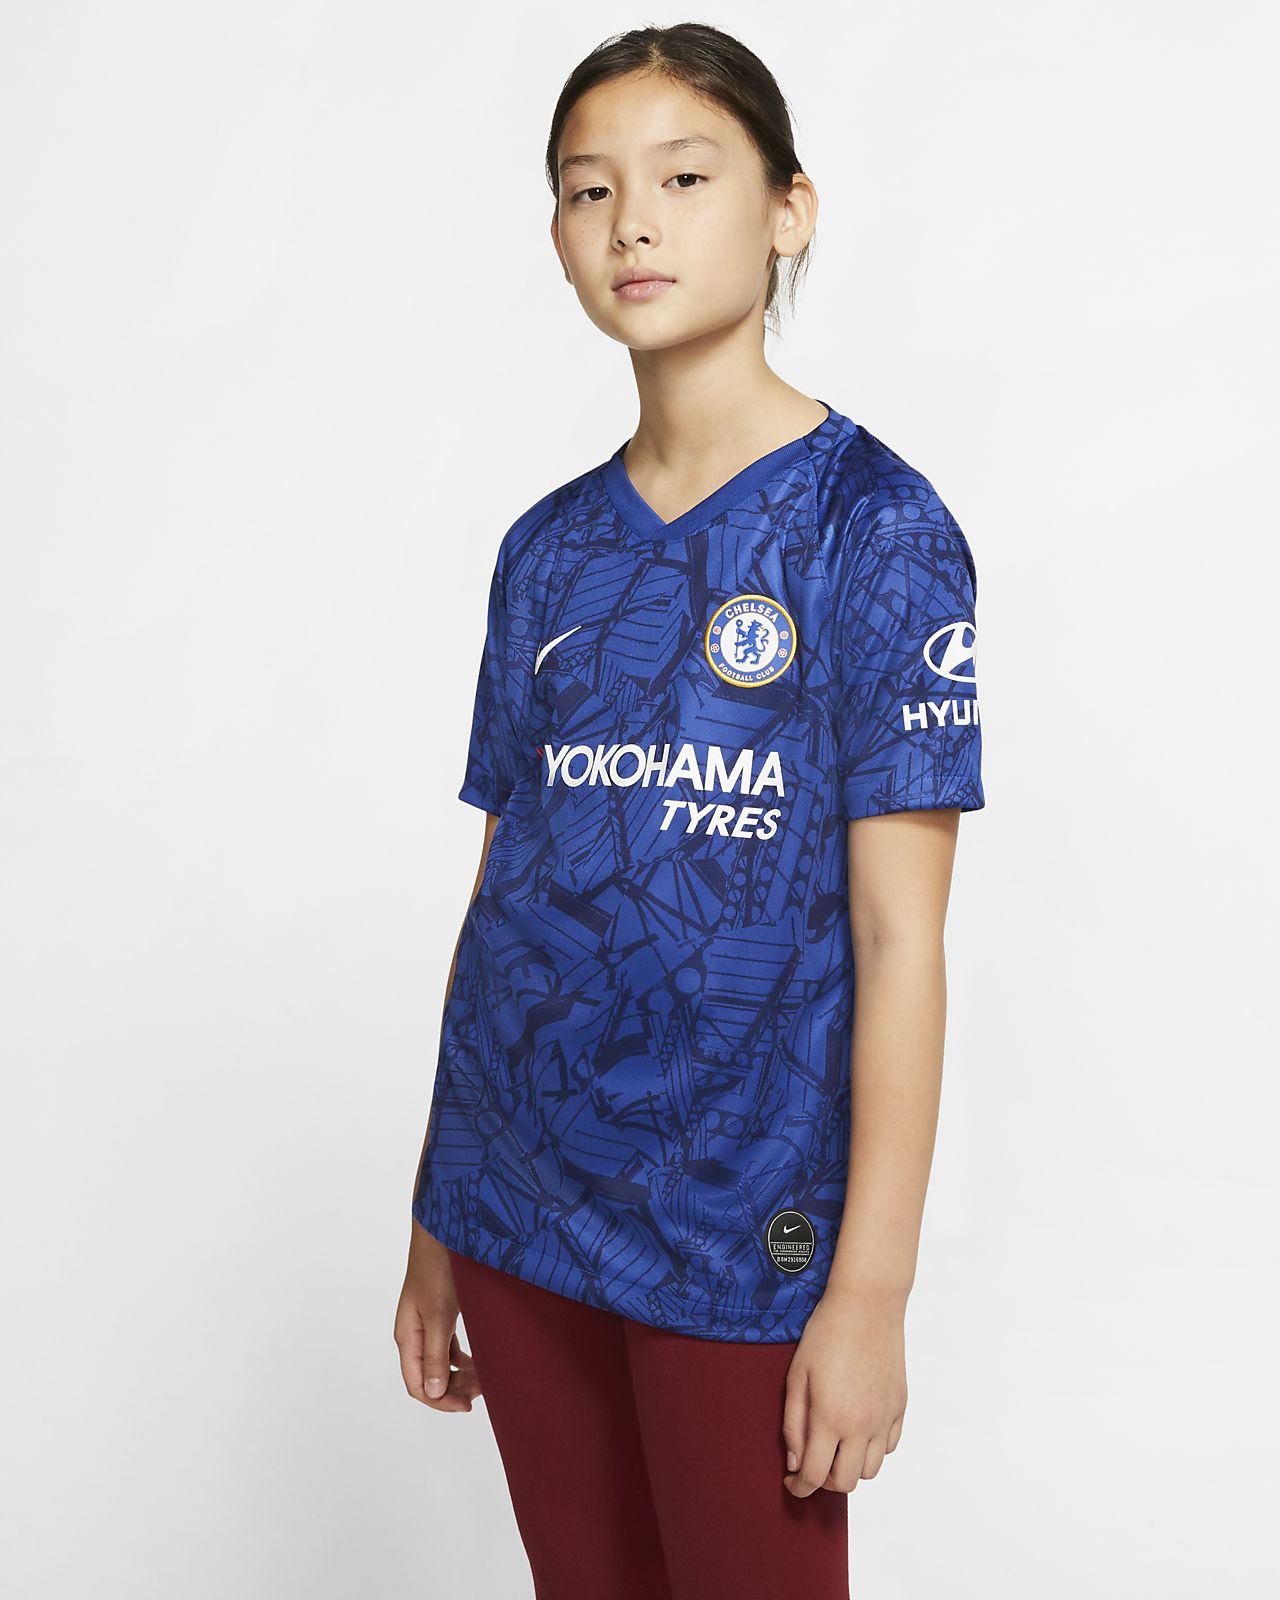 d18b712f9 Chelsea FC 2019 20 Stadium Home Big Kids  Soccer Jersey. Nike.com